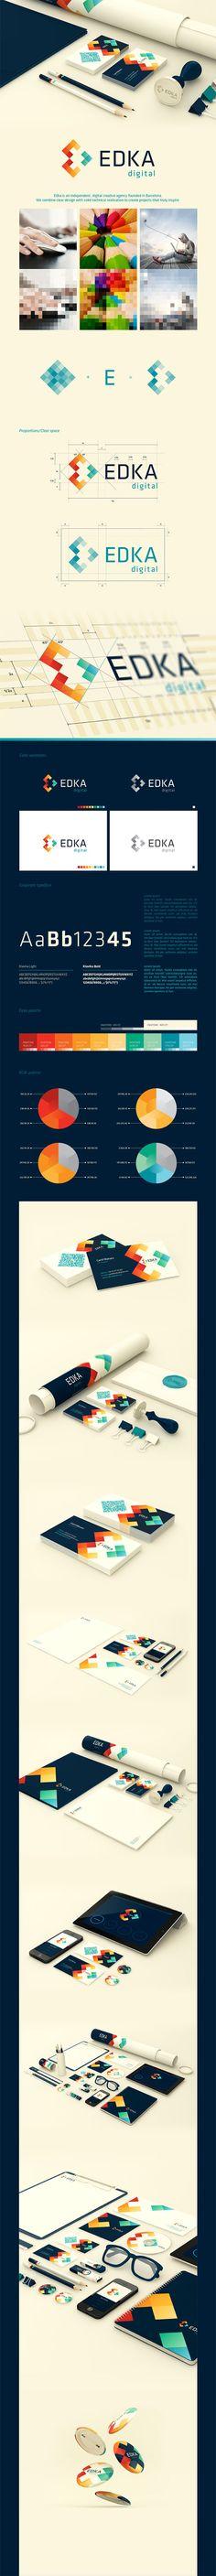 identidad edka #branding #graphicdesign #diseñografico